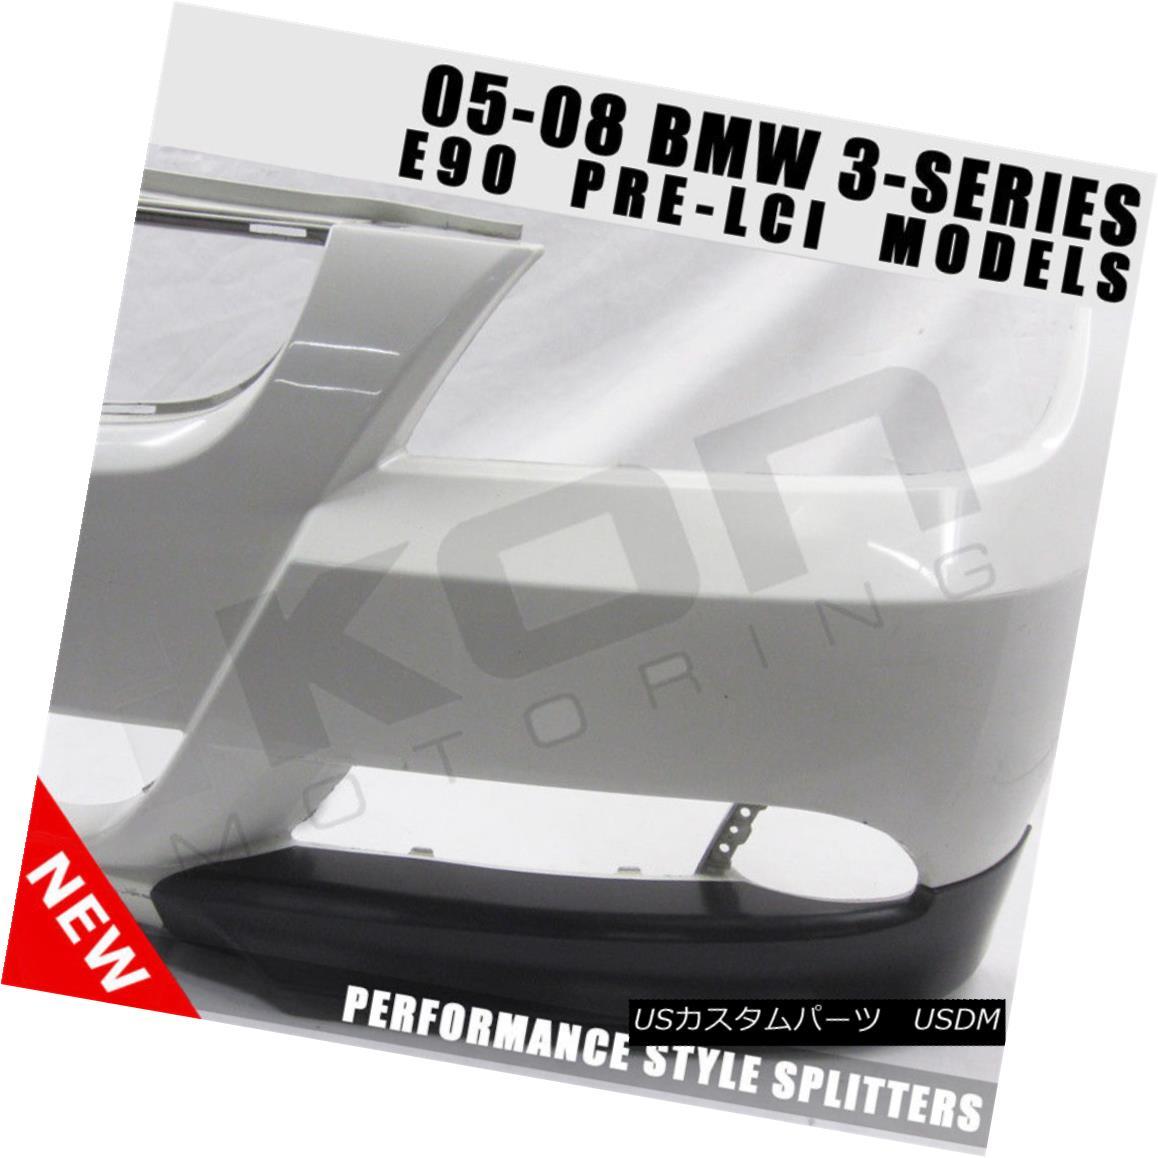 4x100 Wheel Spacers 12x1.5 Studs 4 Lug 60.1mm CB fit for 1993-2002 Honda Civic Mazd cciyu 4pc 1.0 25mm